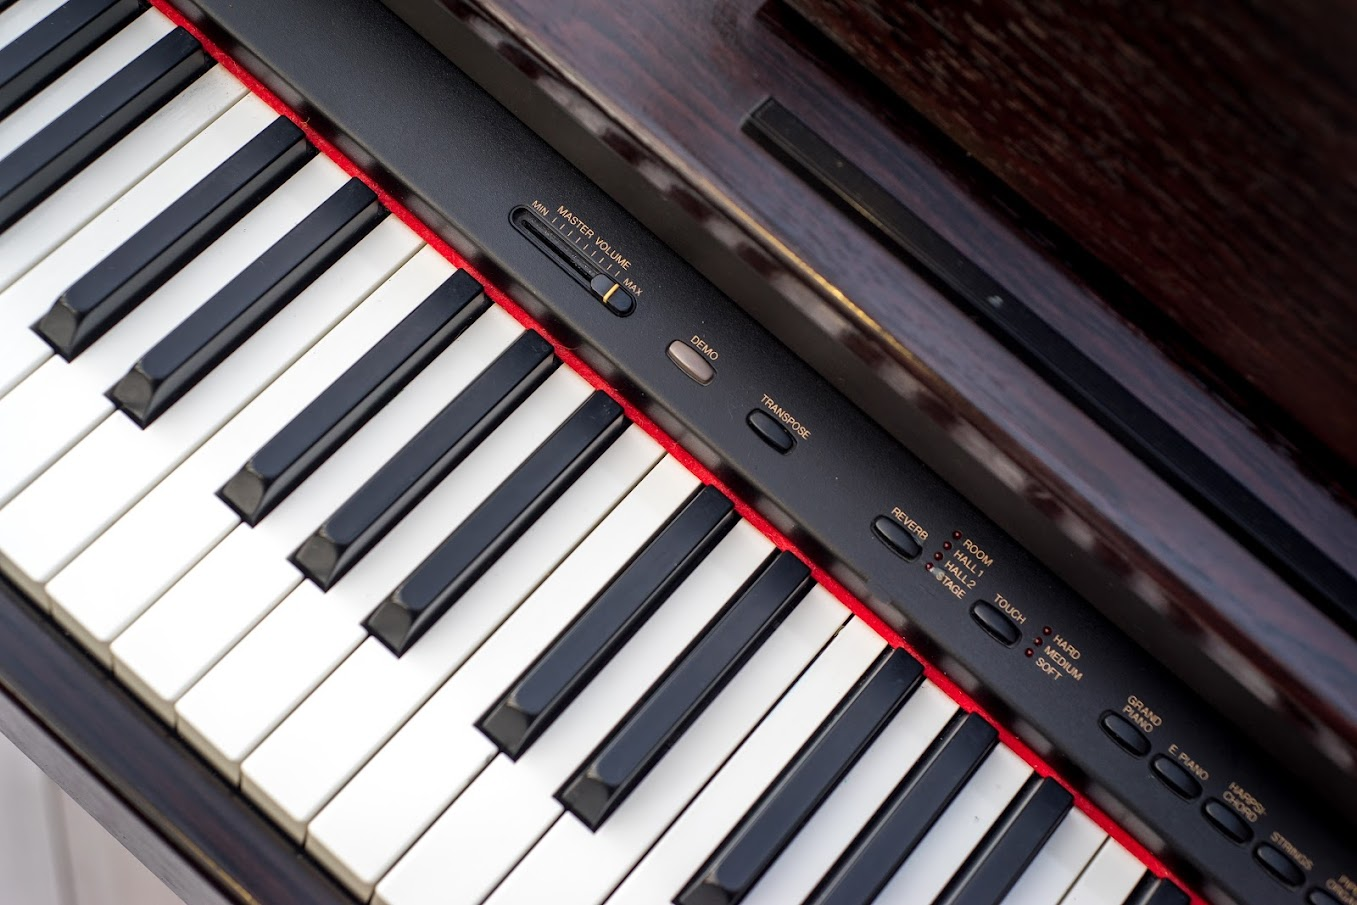 Yamaha arius digital full size piano 88 notes keys gh for Yamaha full size keyboard with 88 keys